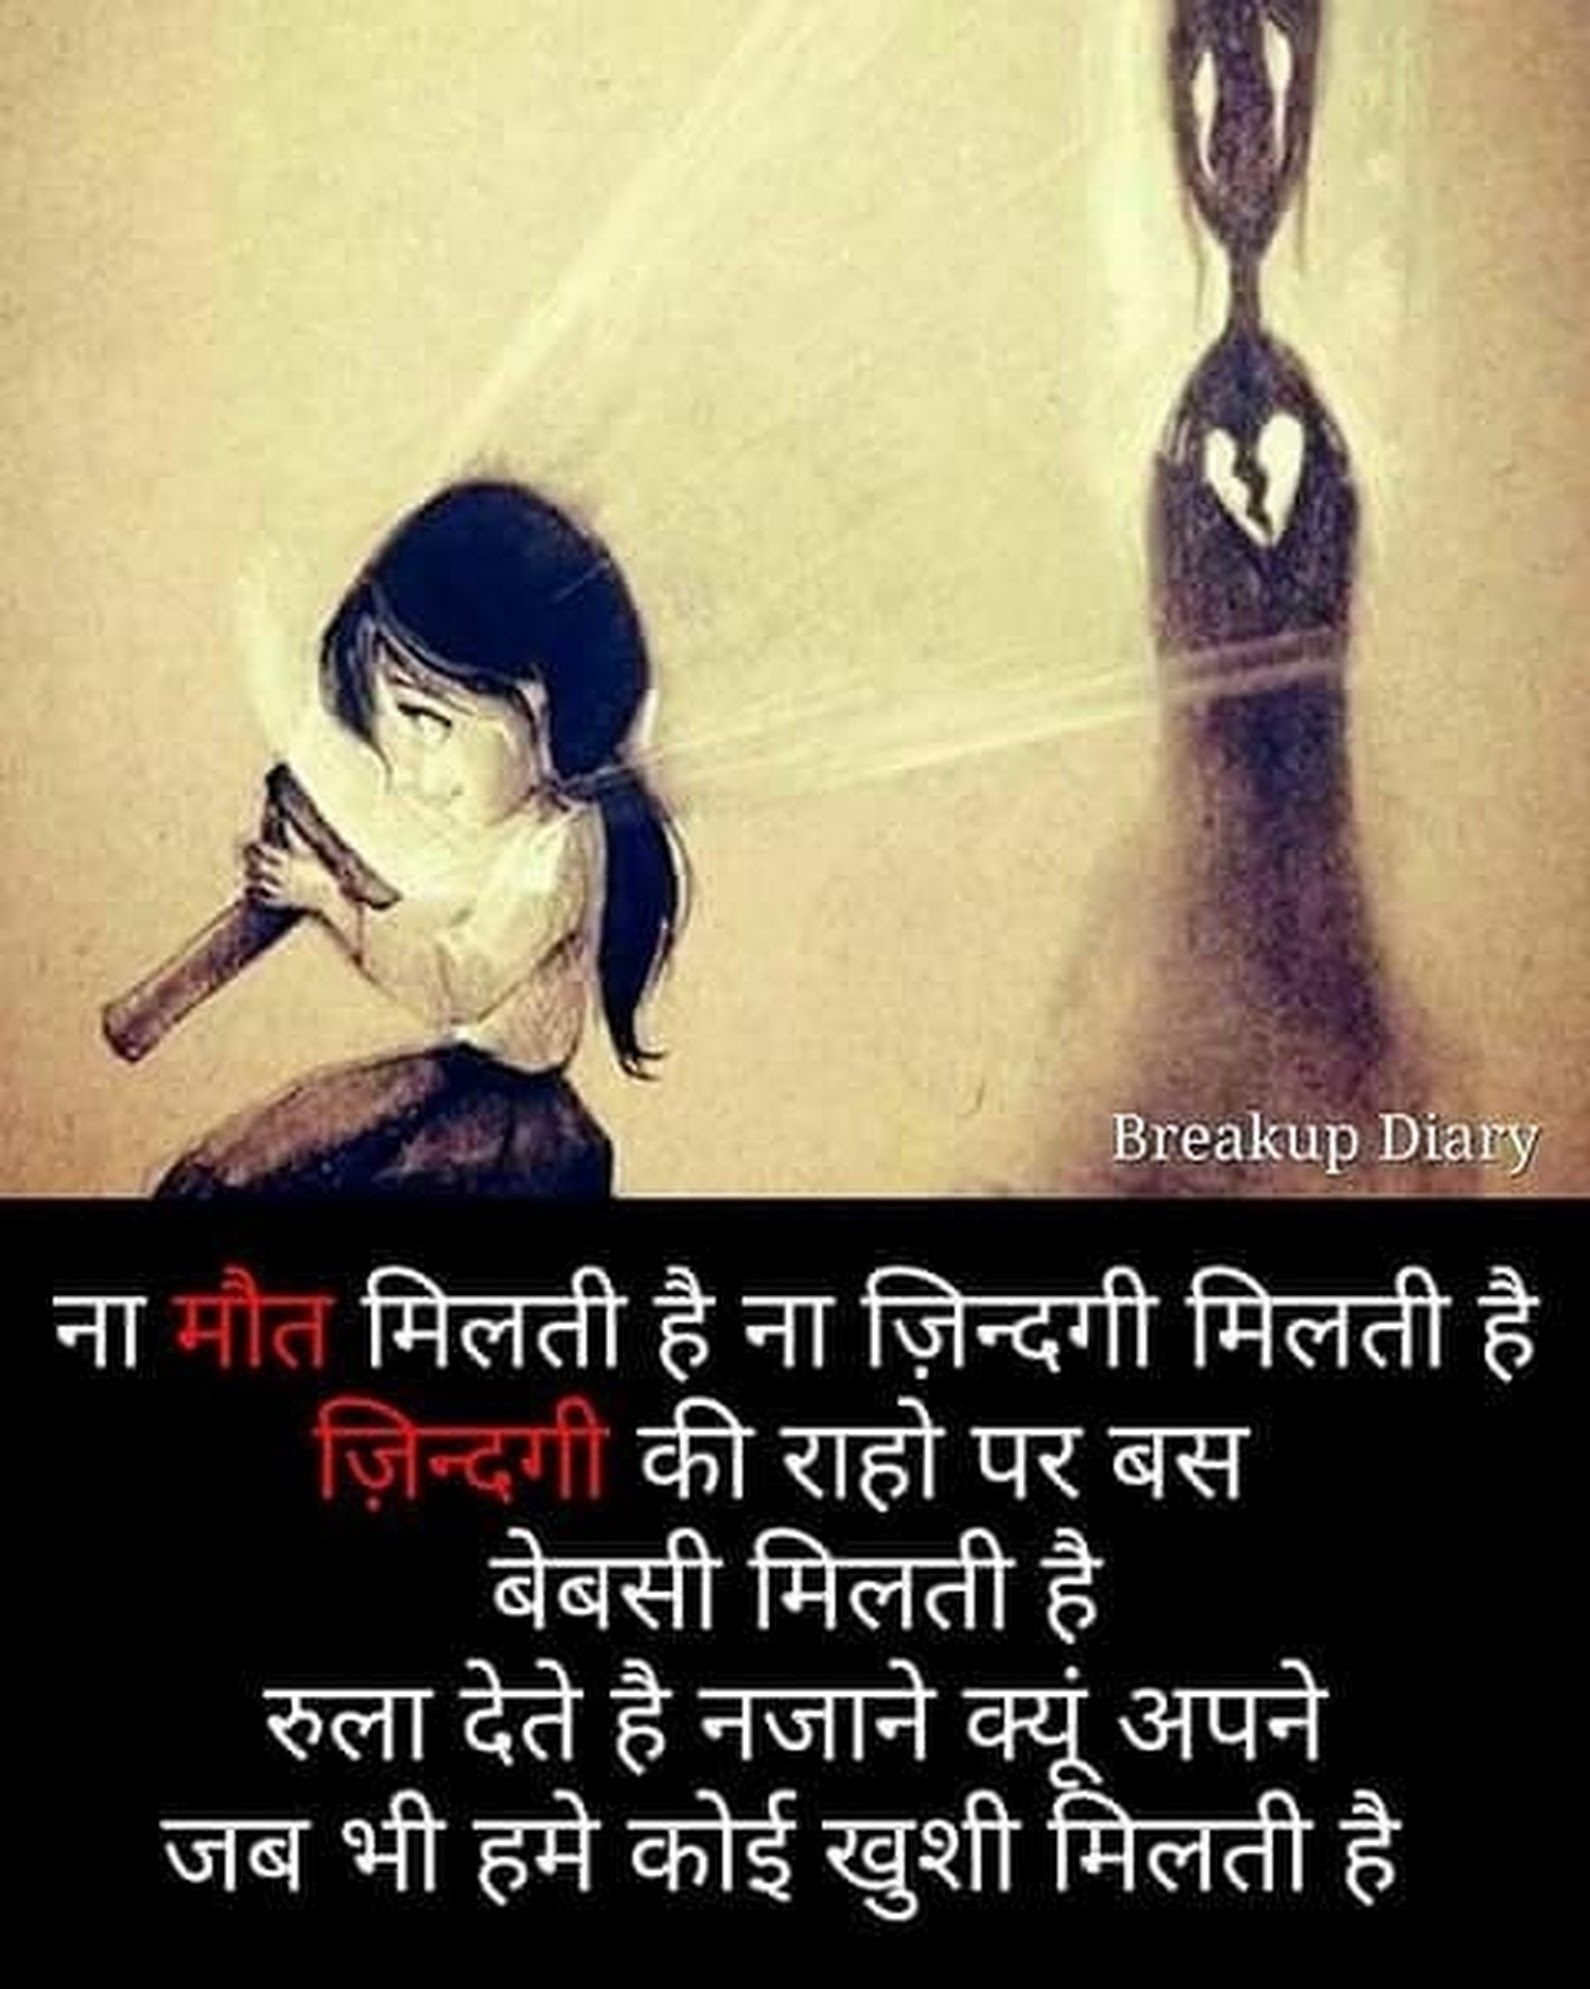 Sign In Broken Heart Broken Heart Pictures Love Quotes In Hindi Broken heart wallpaper hd sad shayari